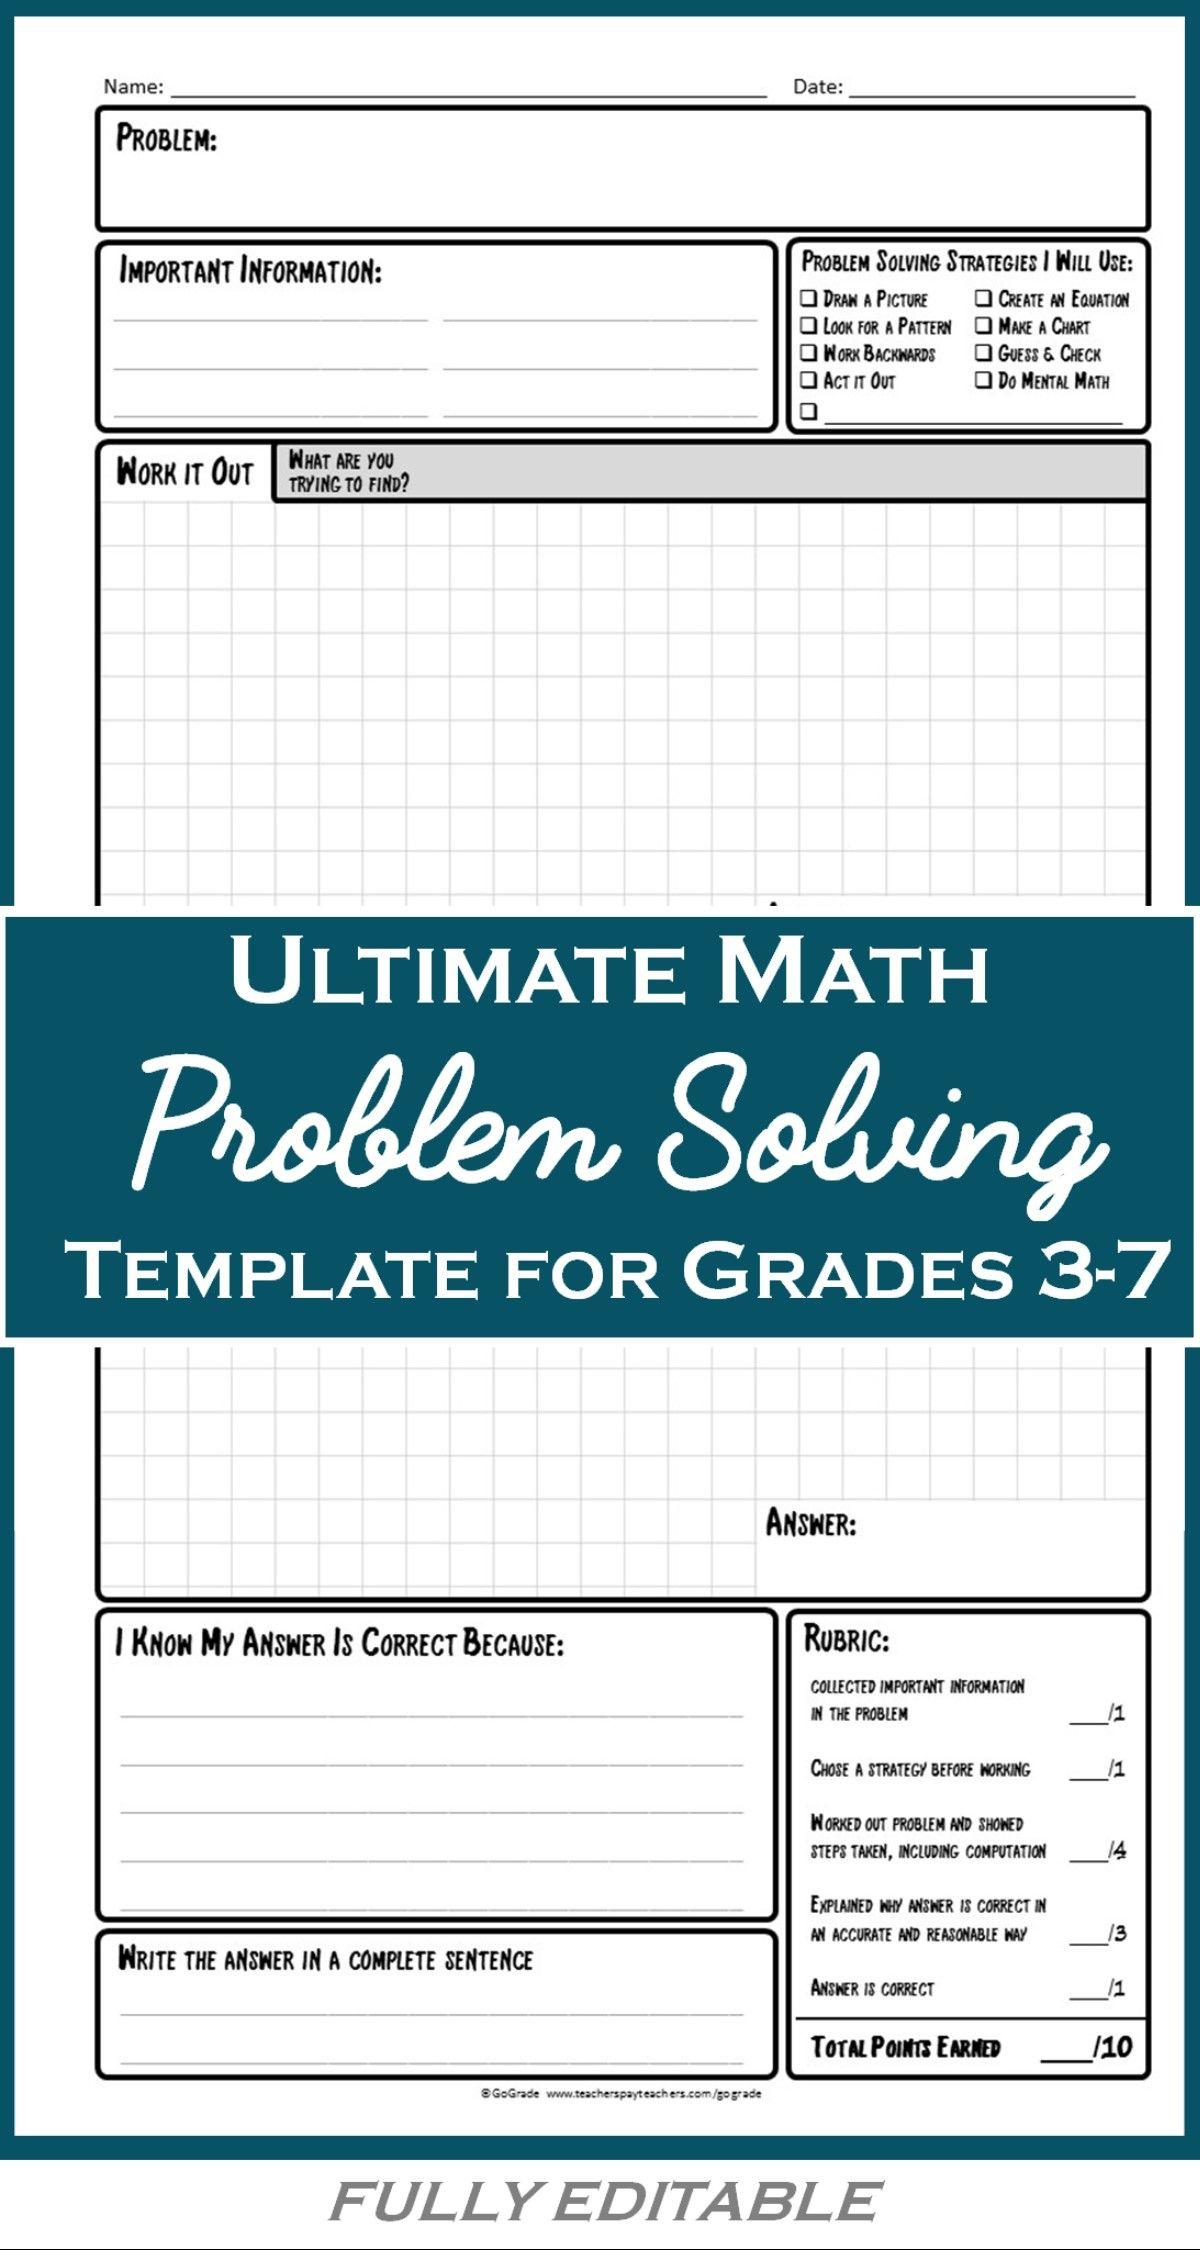 Image Result For Free Printable 6th Grade Math Worksheets